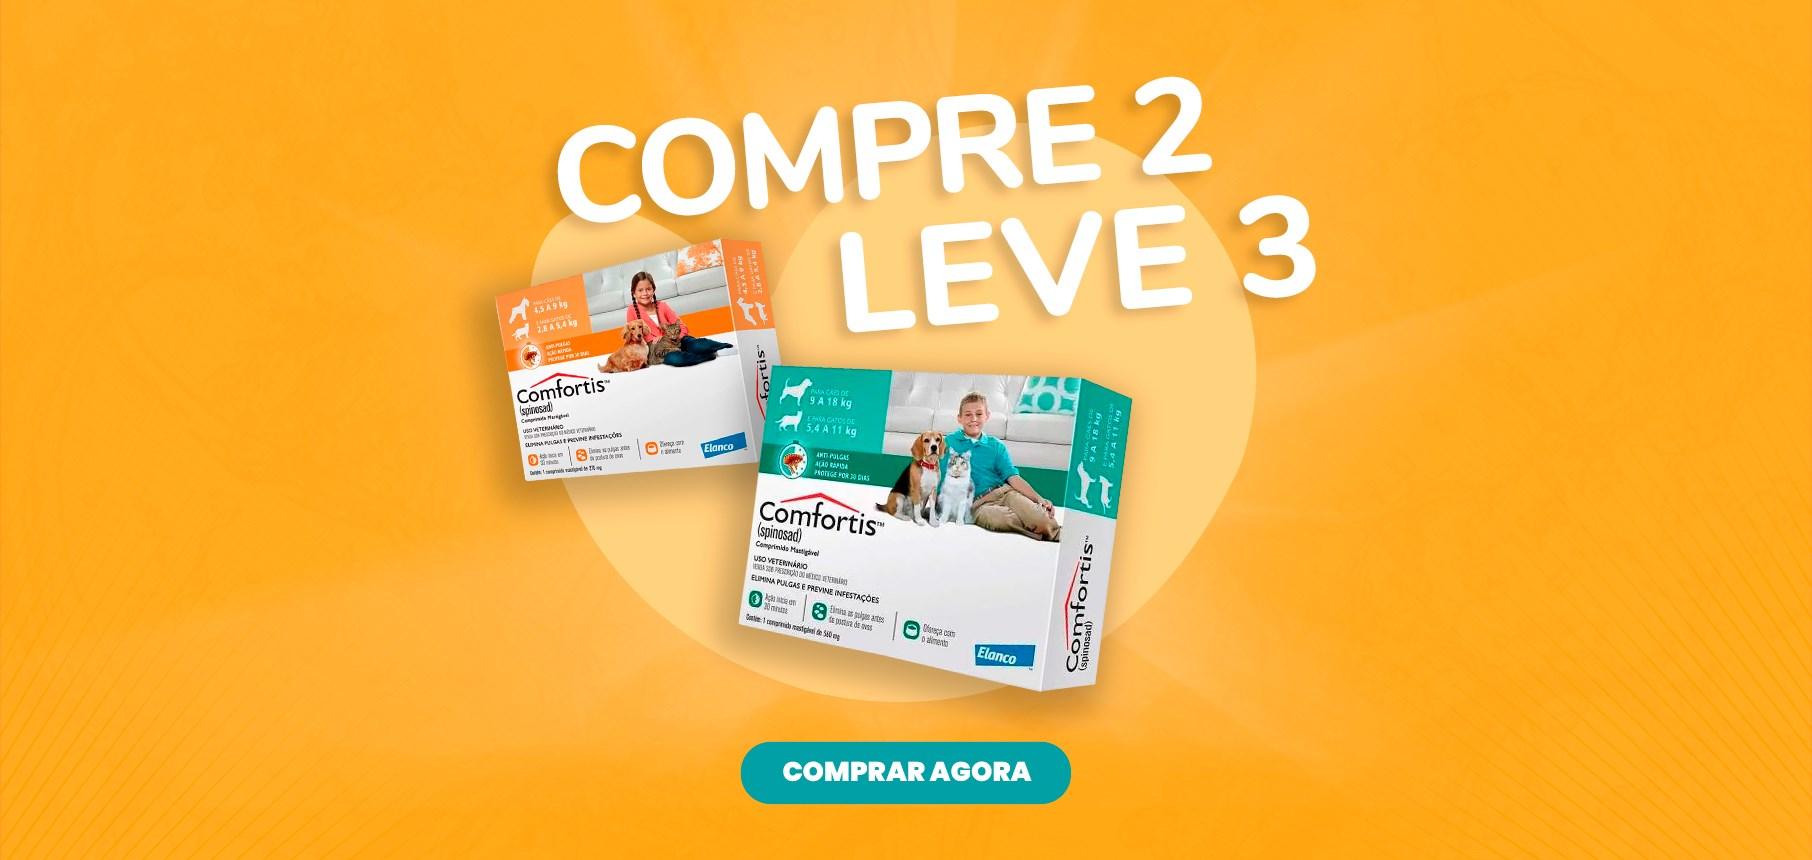 Comfortis Compre 2, Leve 3